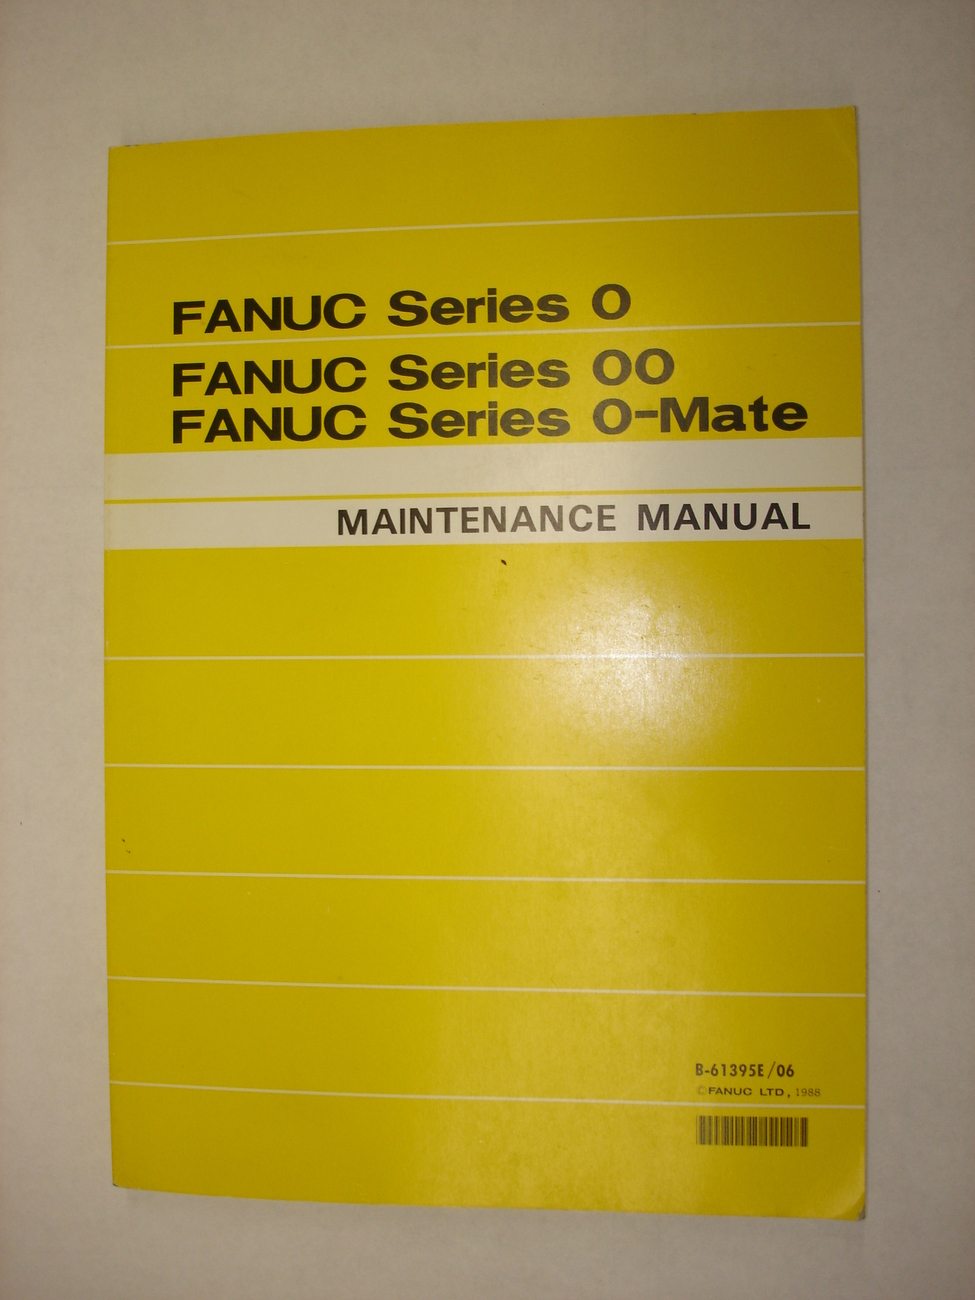 Fanuc Series 0 Maintenance Manual